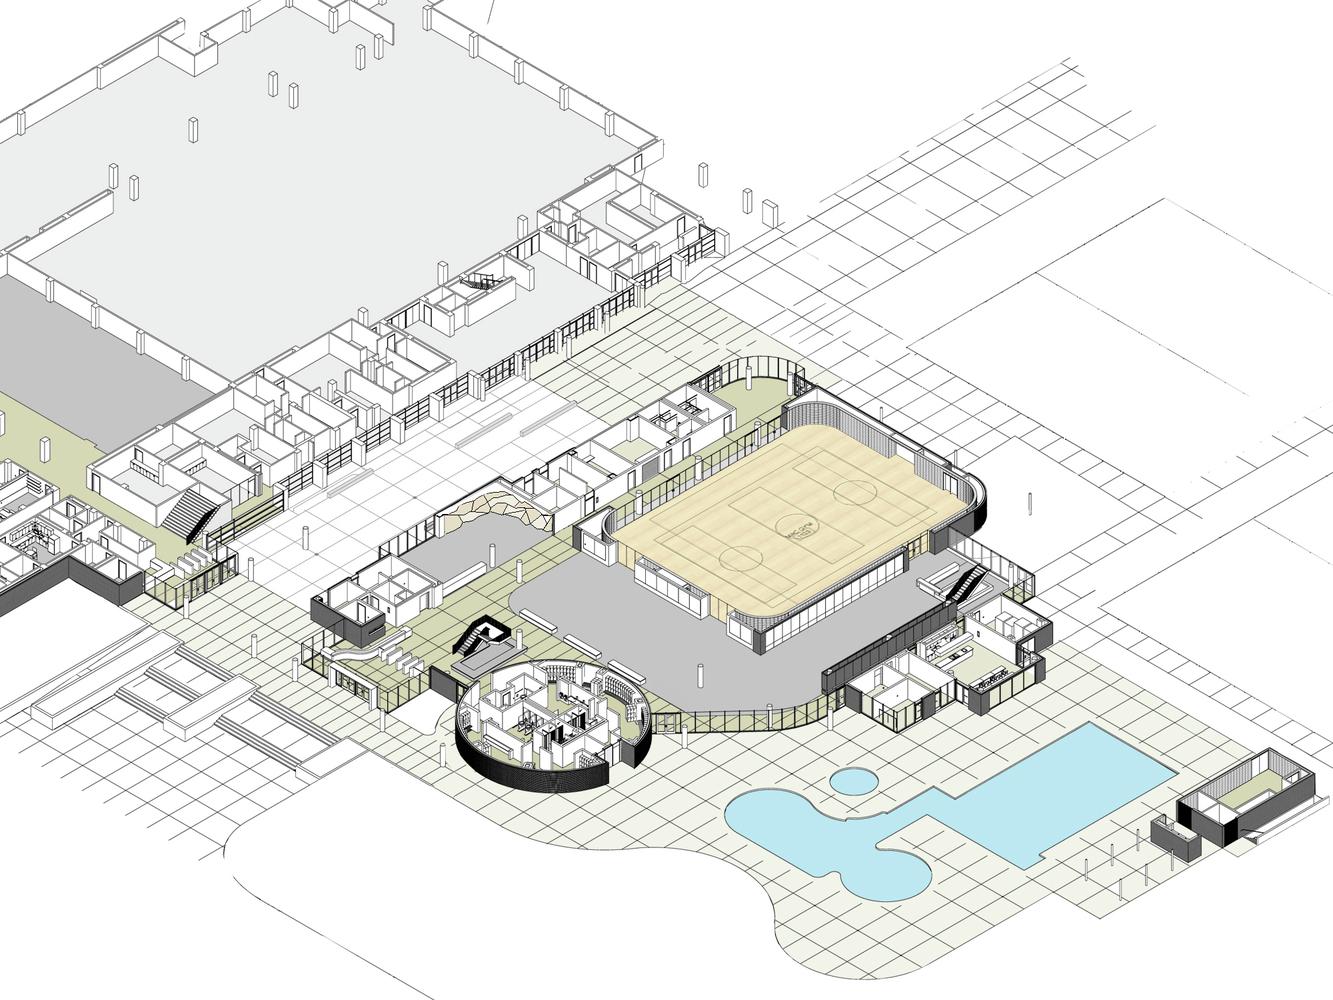 University Of California Riverside Student Recreation Center Expansion /  Cannon Design,axonometric Floor Plan 01